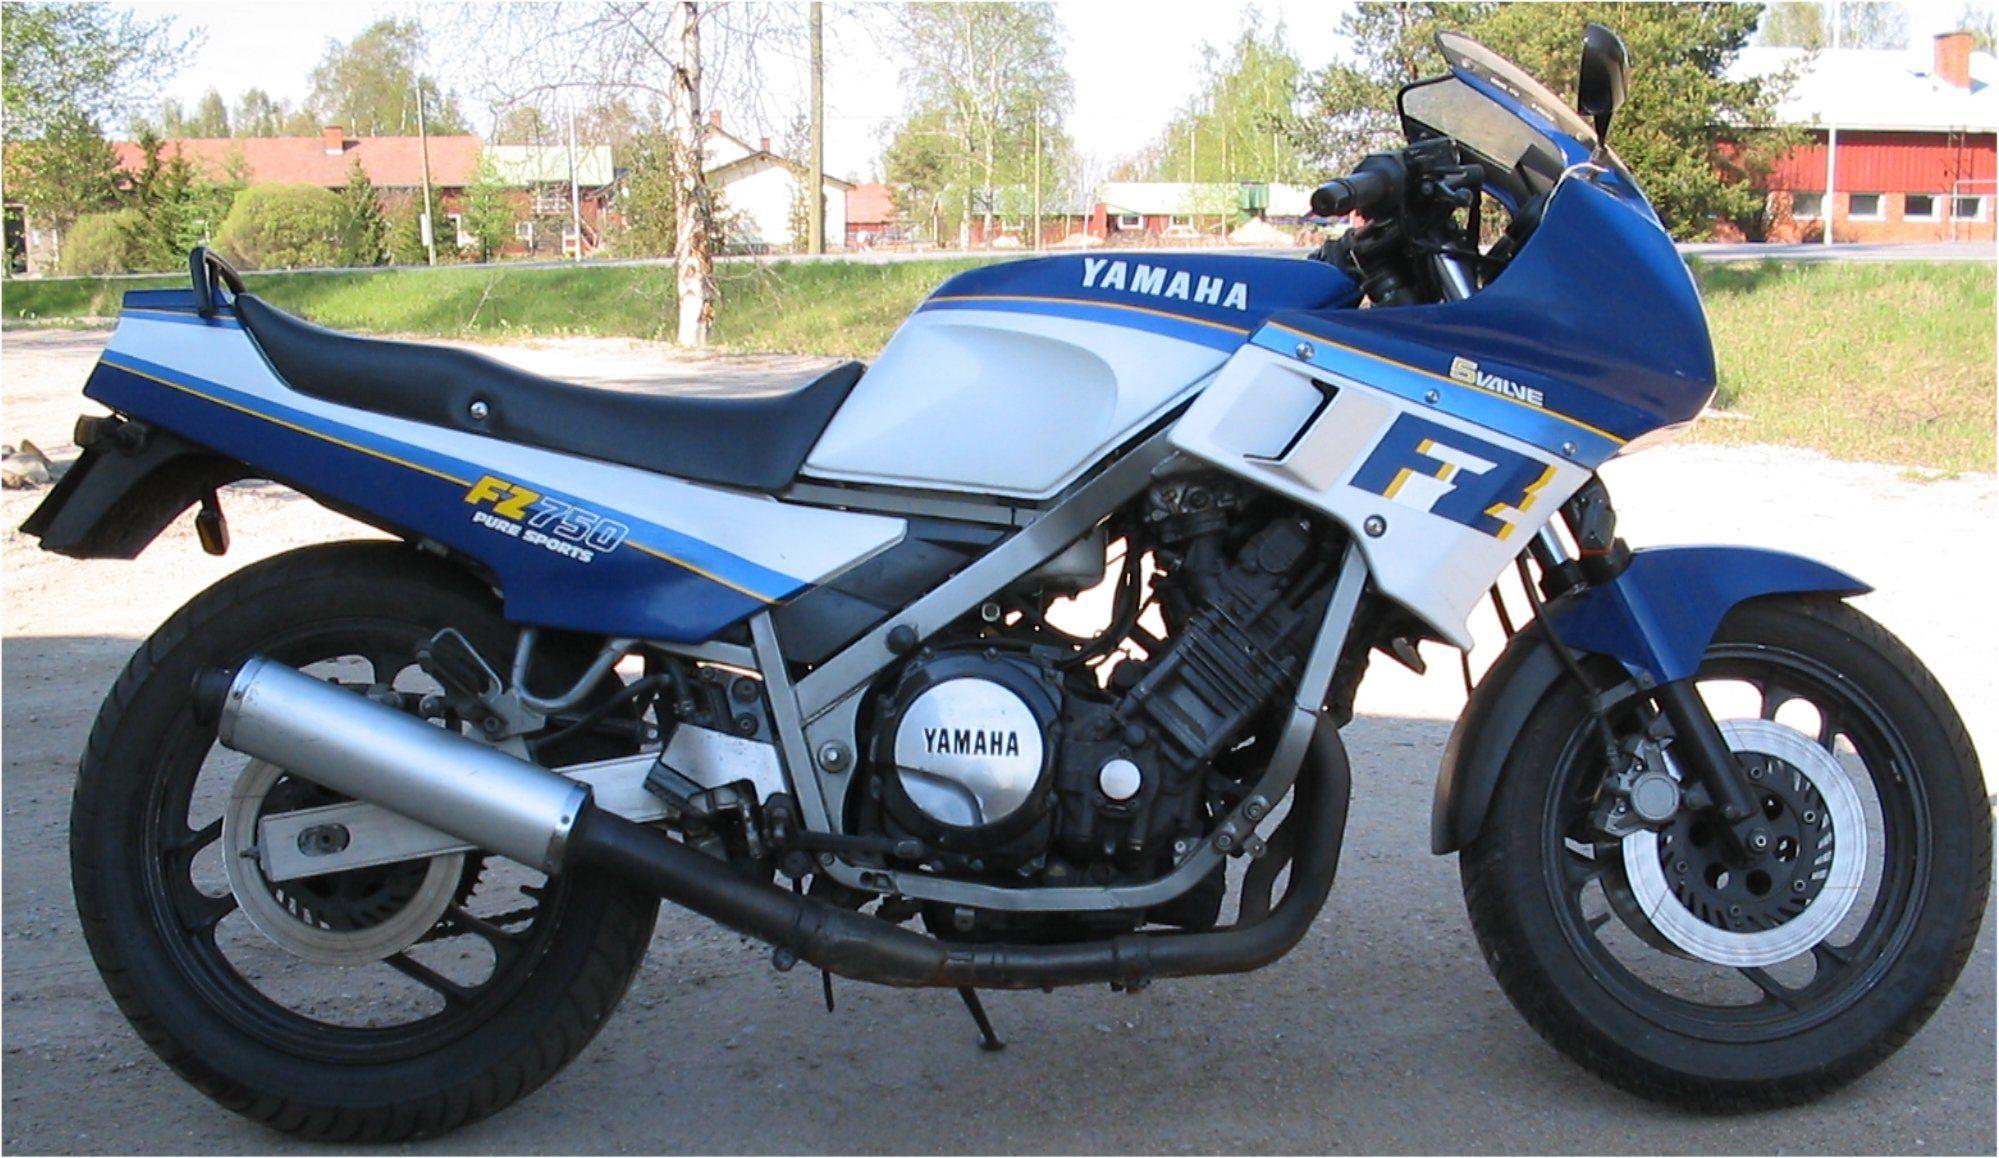 Yamaha FZ FI - Features that Keep it Fresh! » MotorOctane